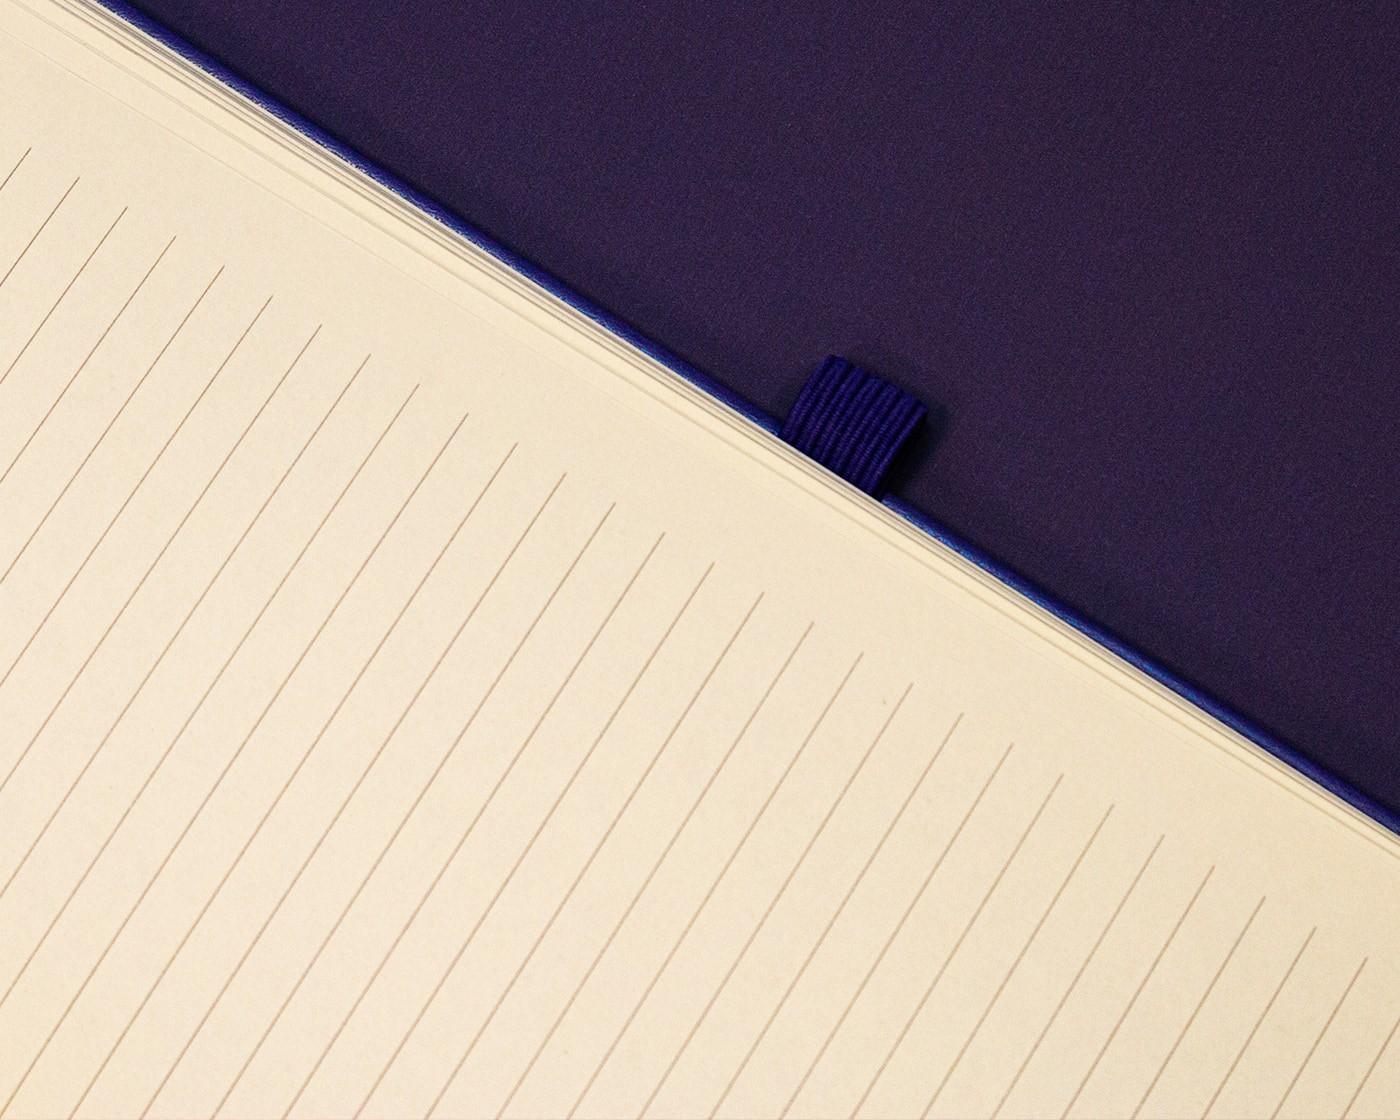 Corporate-Notebook-Paper